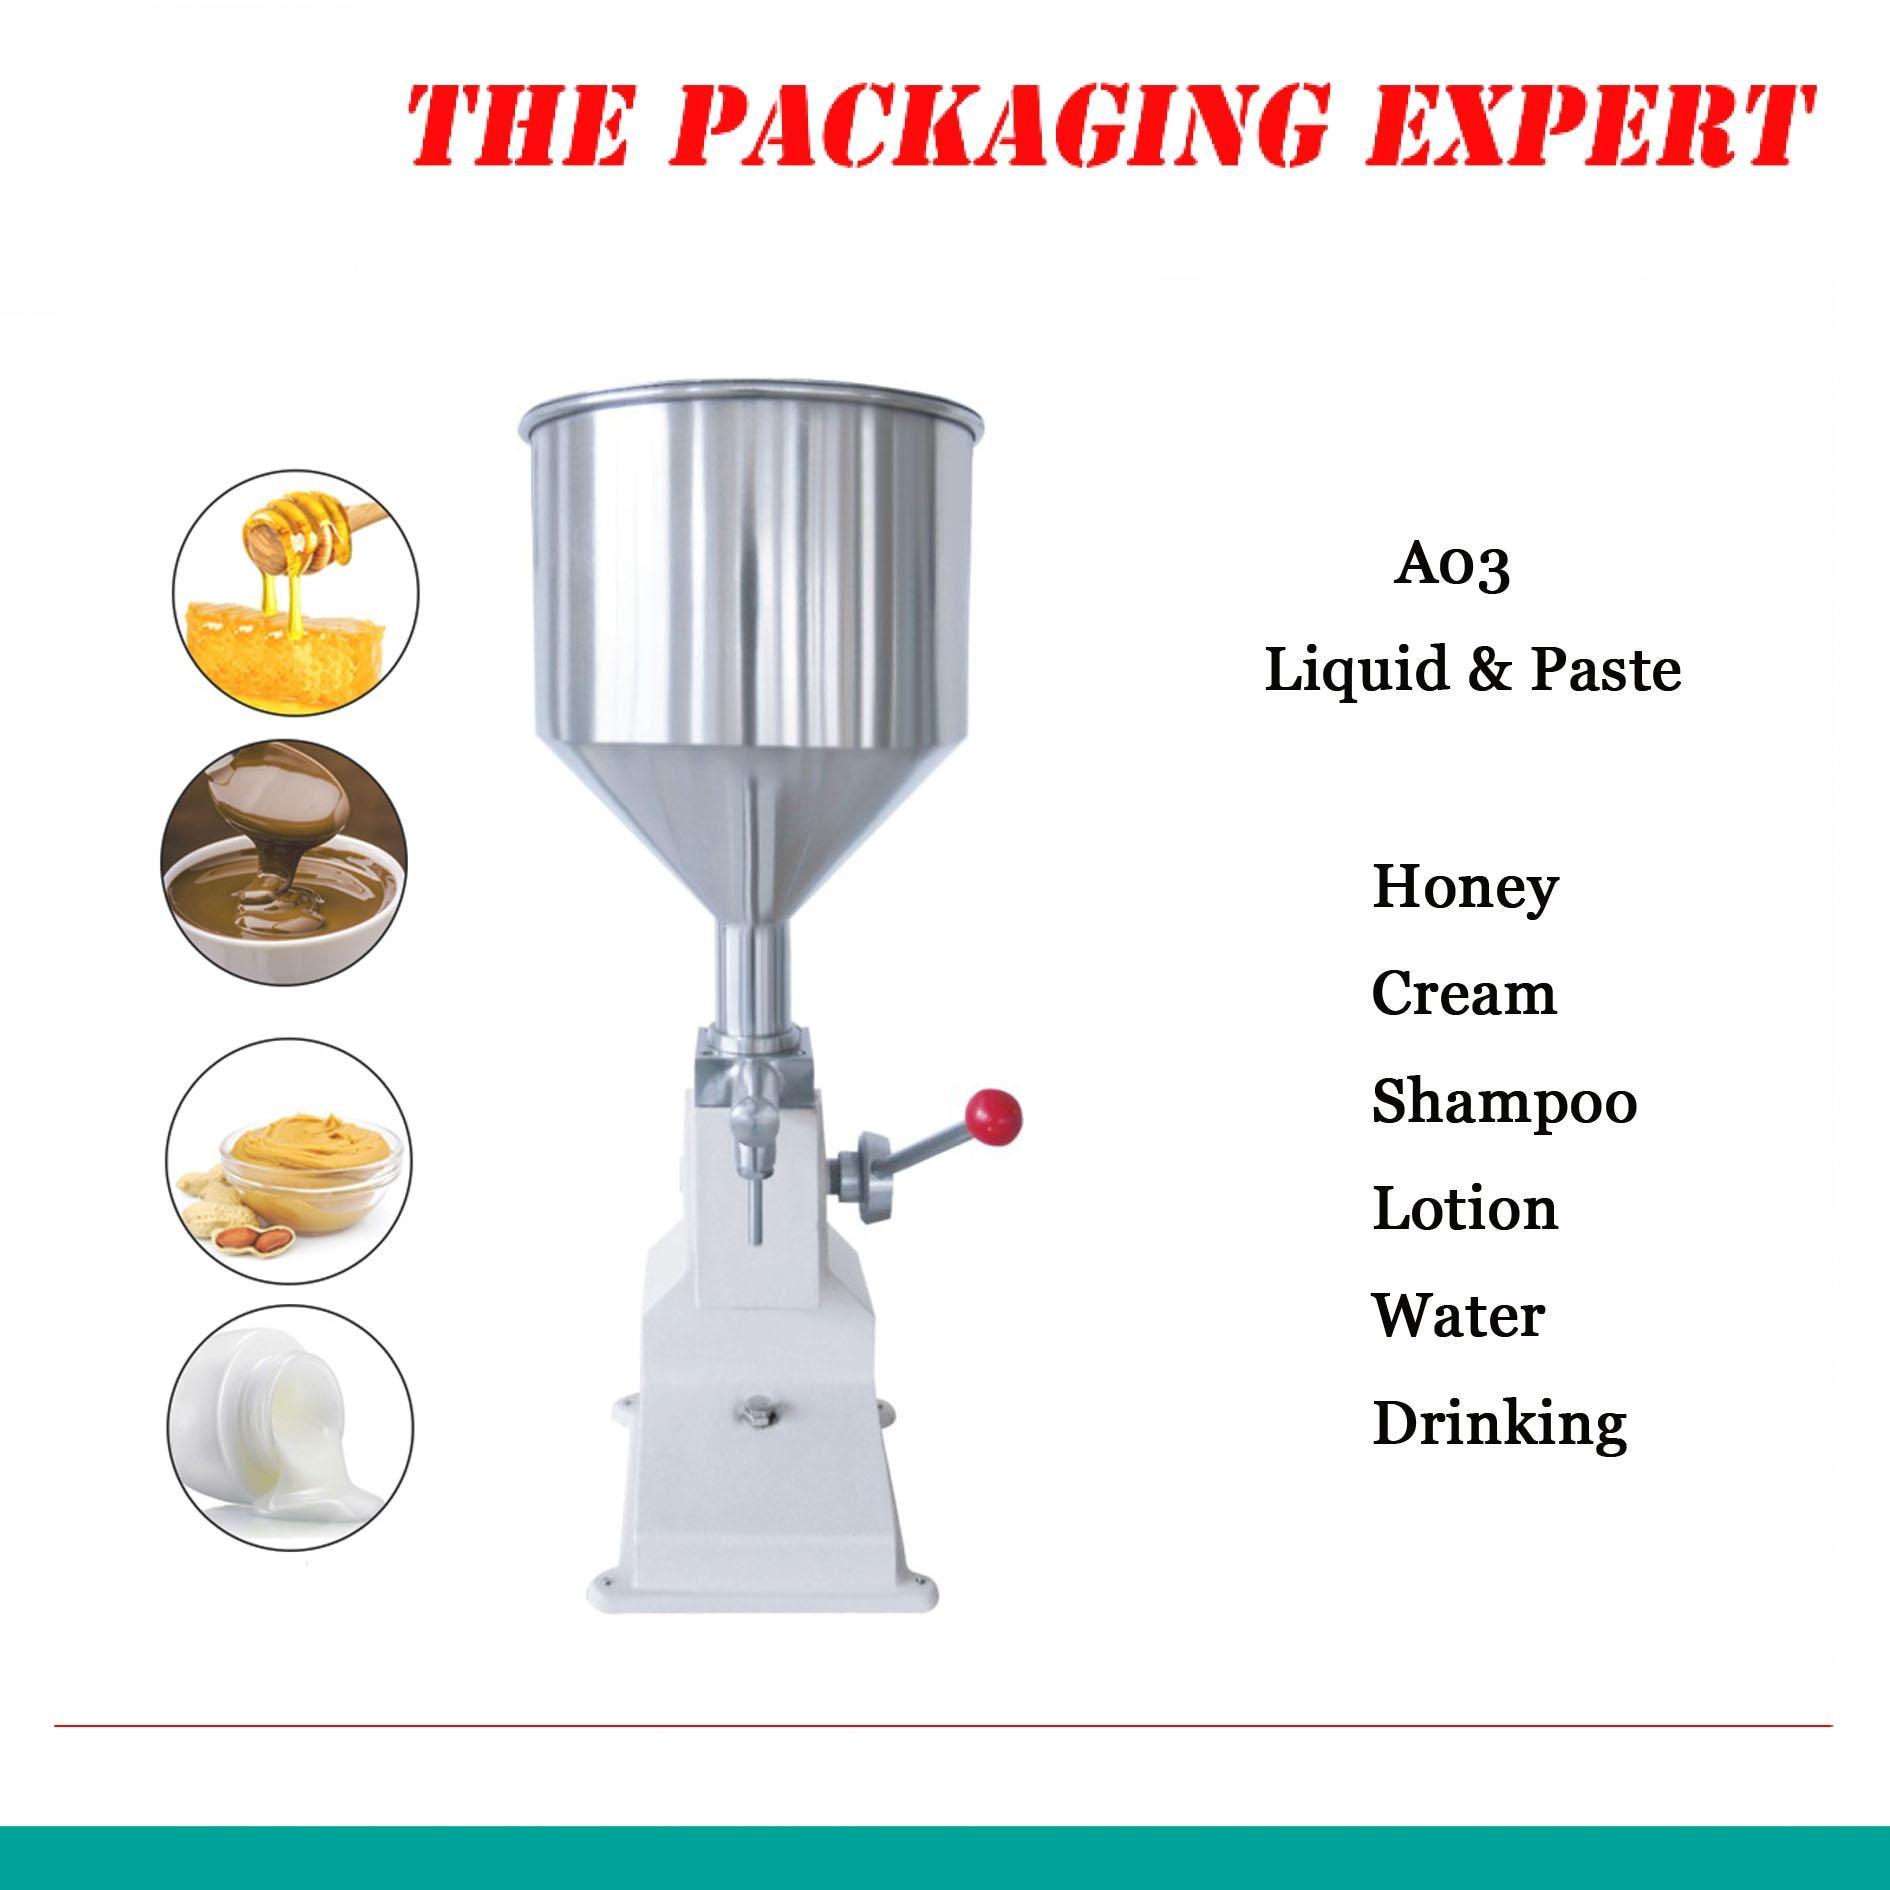 A03 Manual Filling Machine Manual Nail Polish Shampoo Filling Machine 5~50ml For Cream Shampoo Cosmetic Liquid Paste Oil Filler